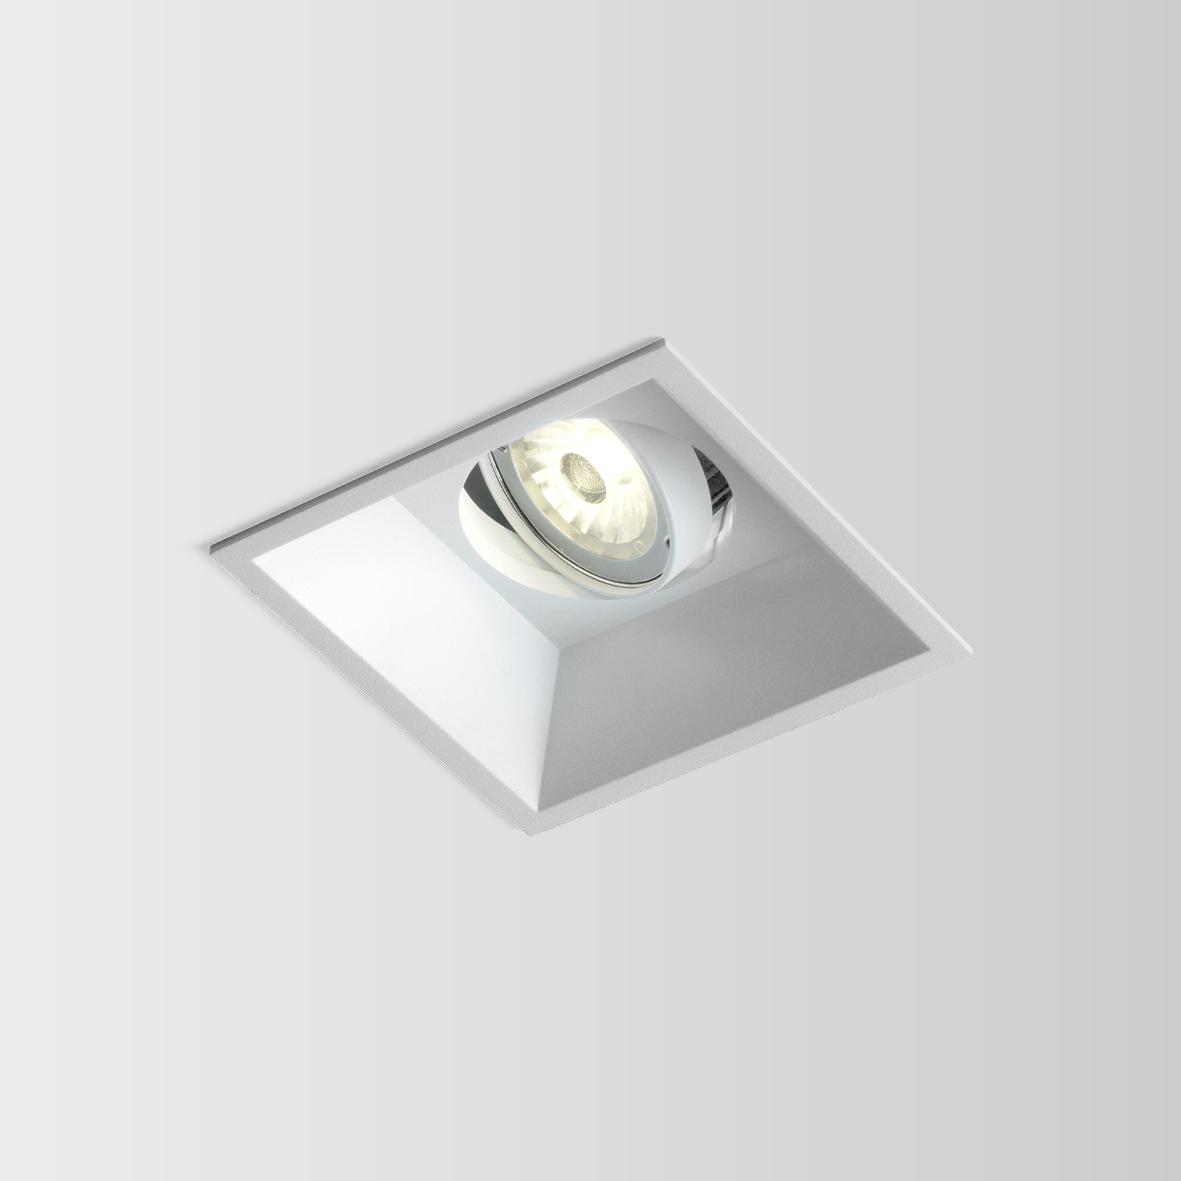 PYRAMID 1.0 LED 7/10W 2700K 90CRI 350-500mA, Valge